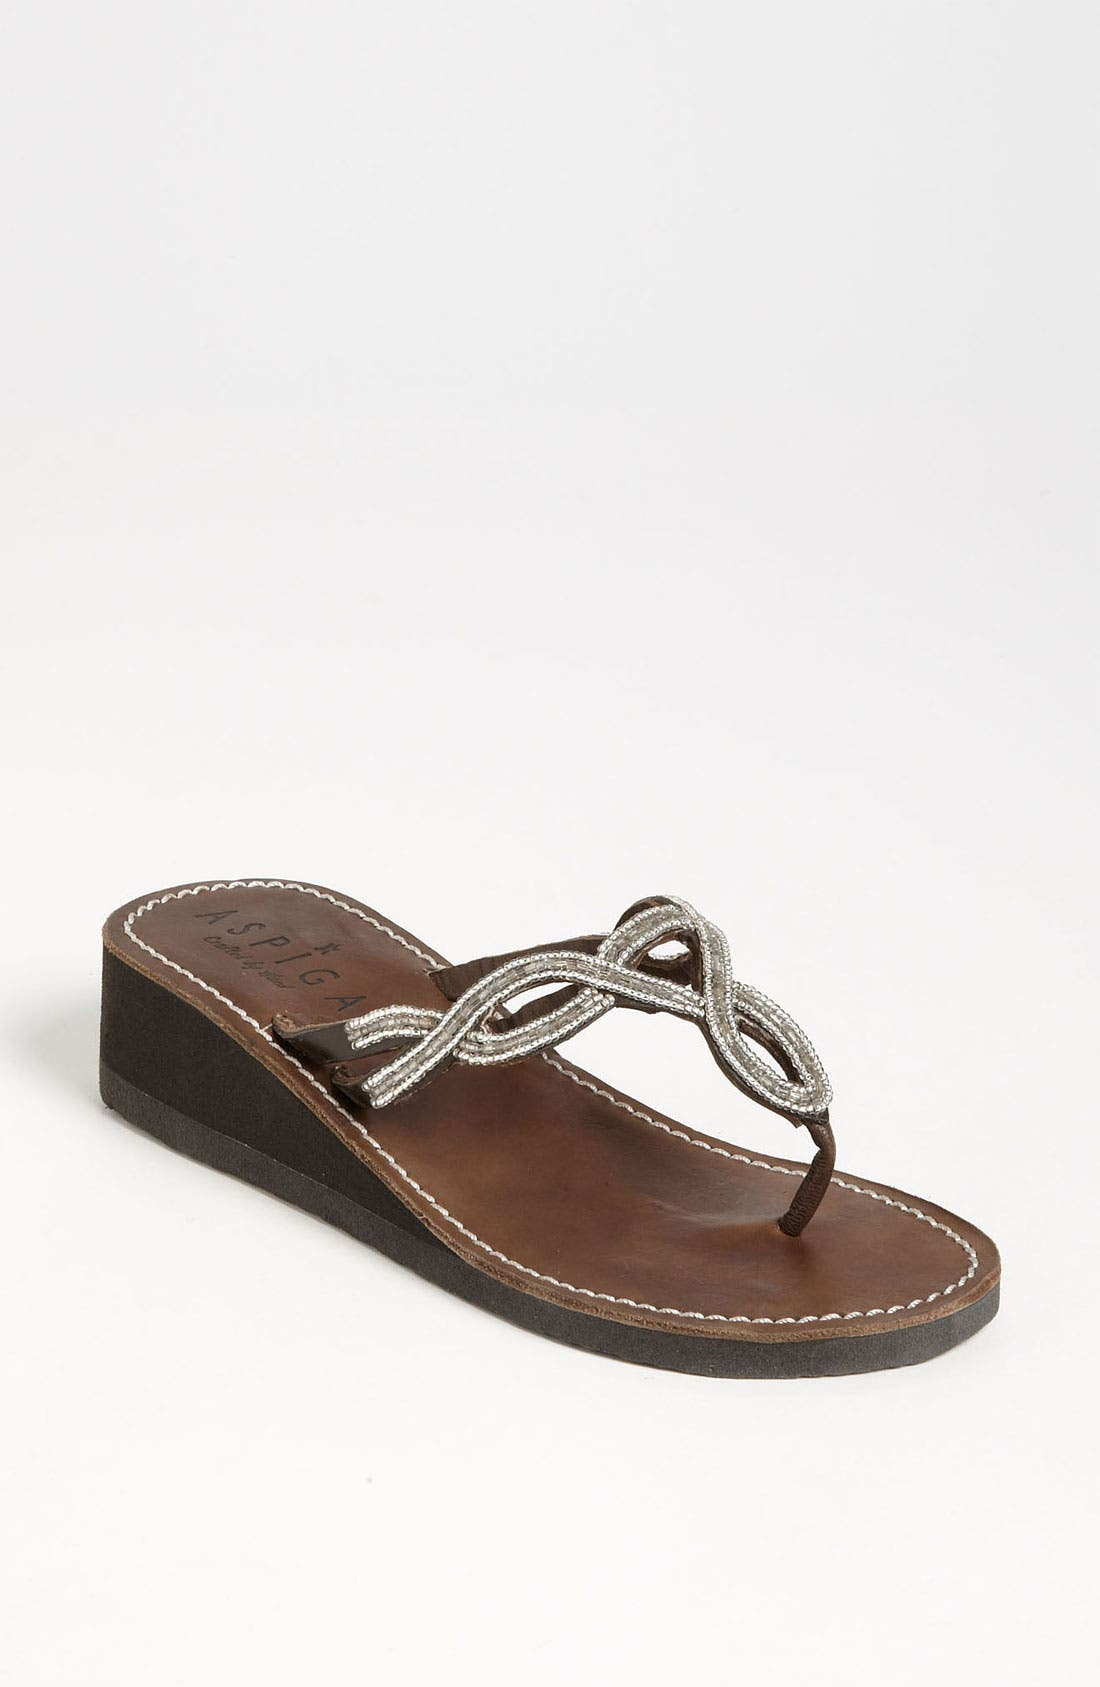 Alternate Image 1 Selected - Aspiga 'Zanzibar' Sandal